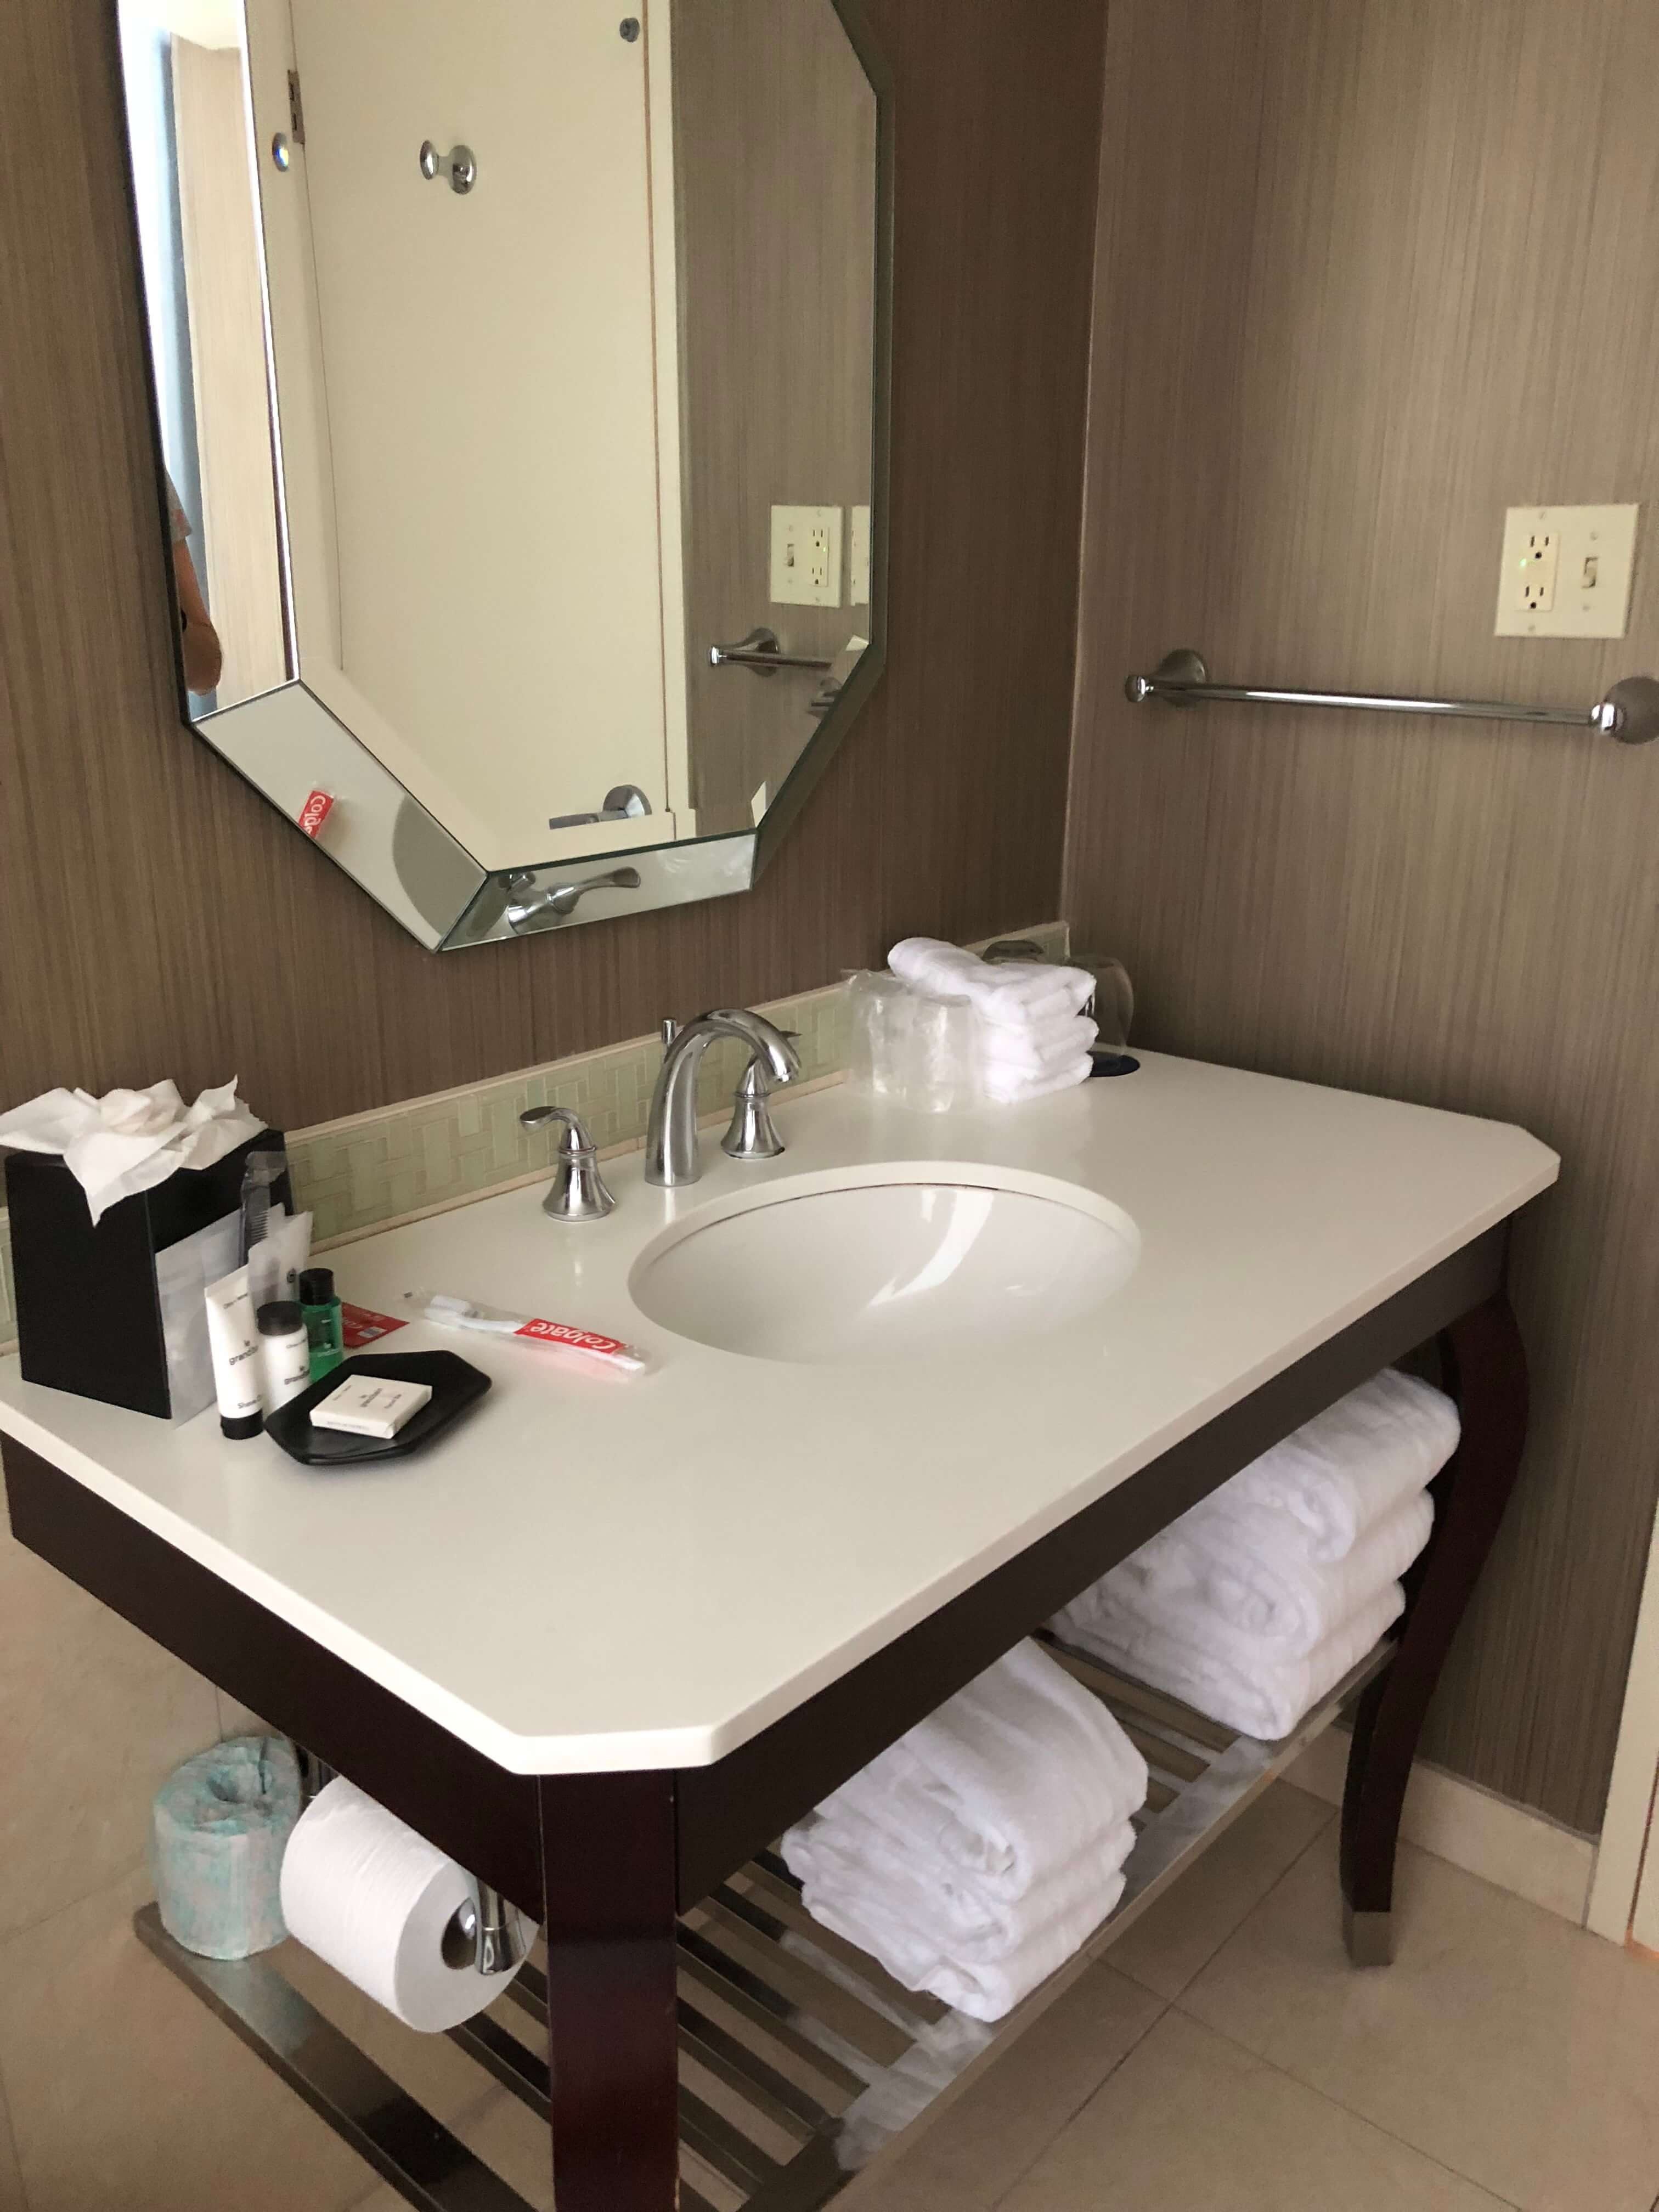 Sheraton Philadelphia Society Hill bathroom